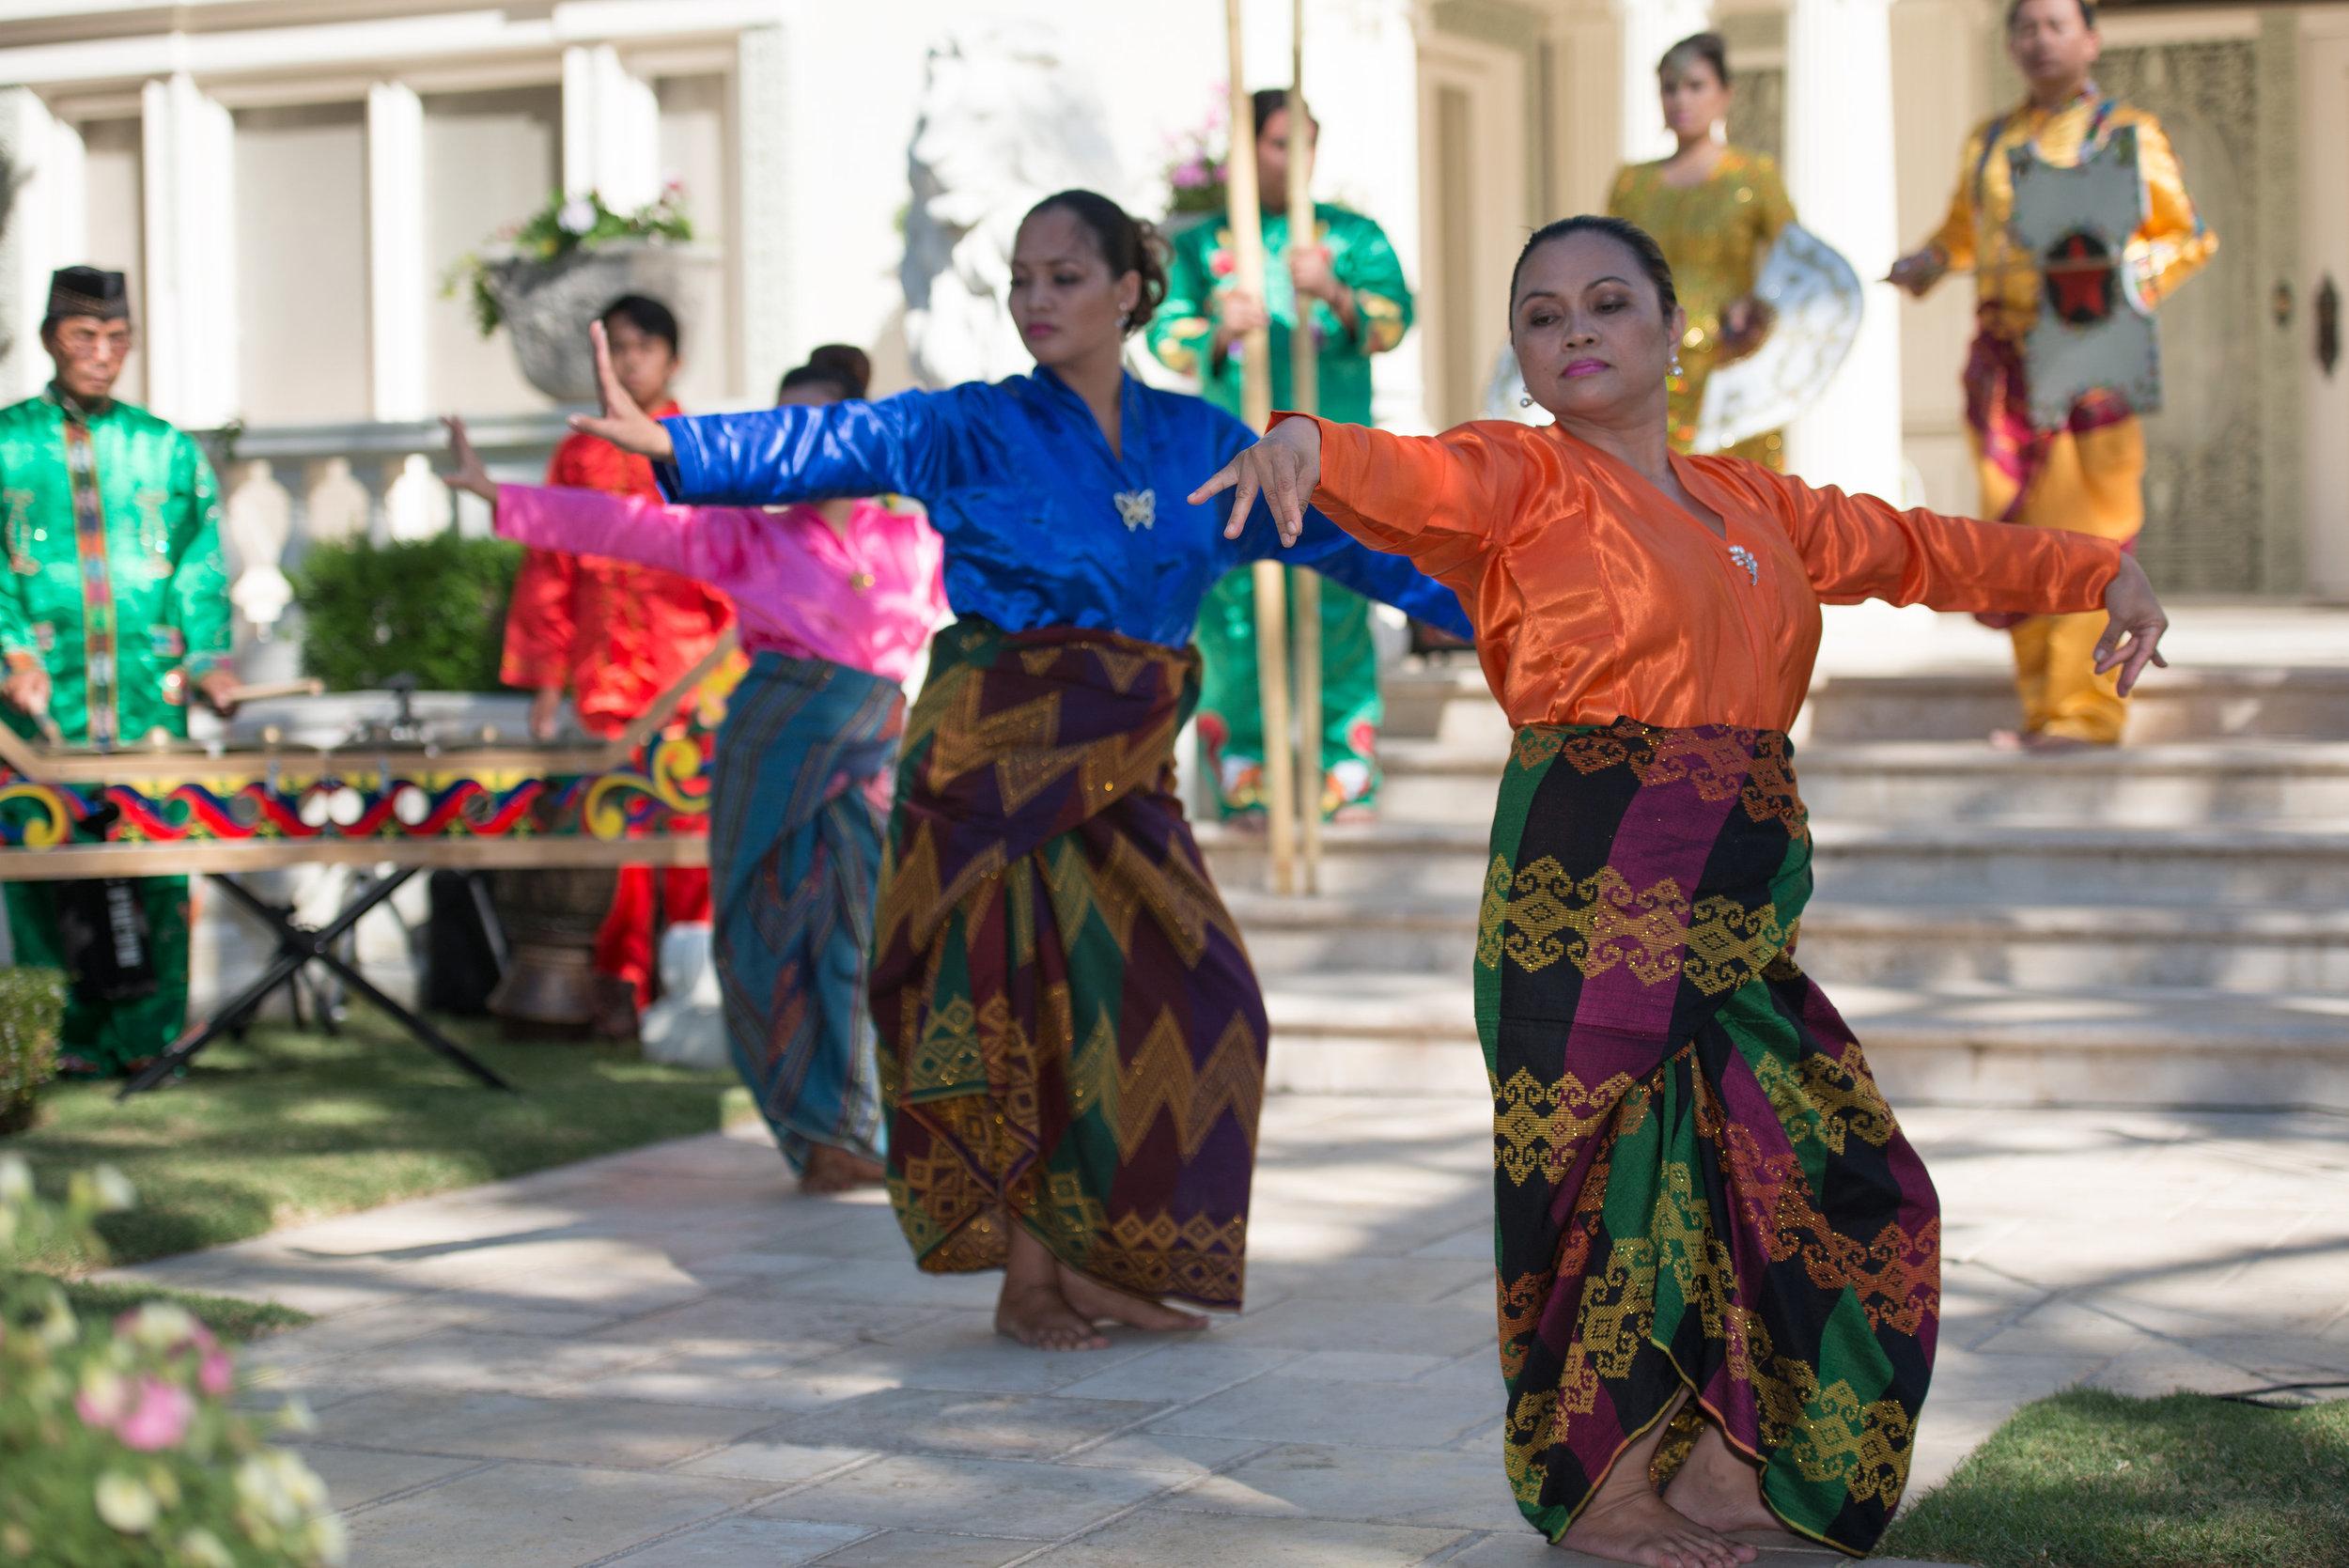 Tinikling dance (traditional Filipino dance)